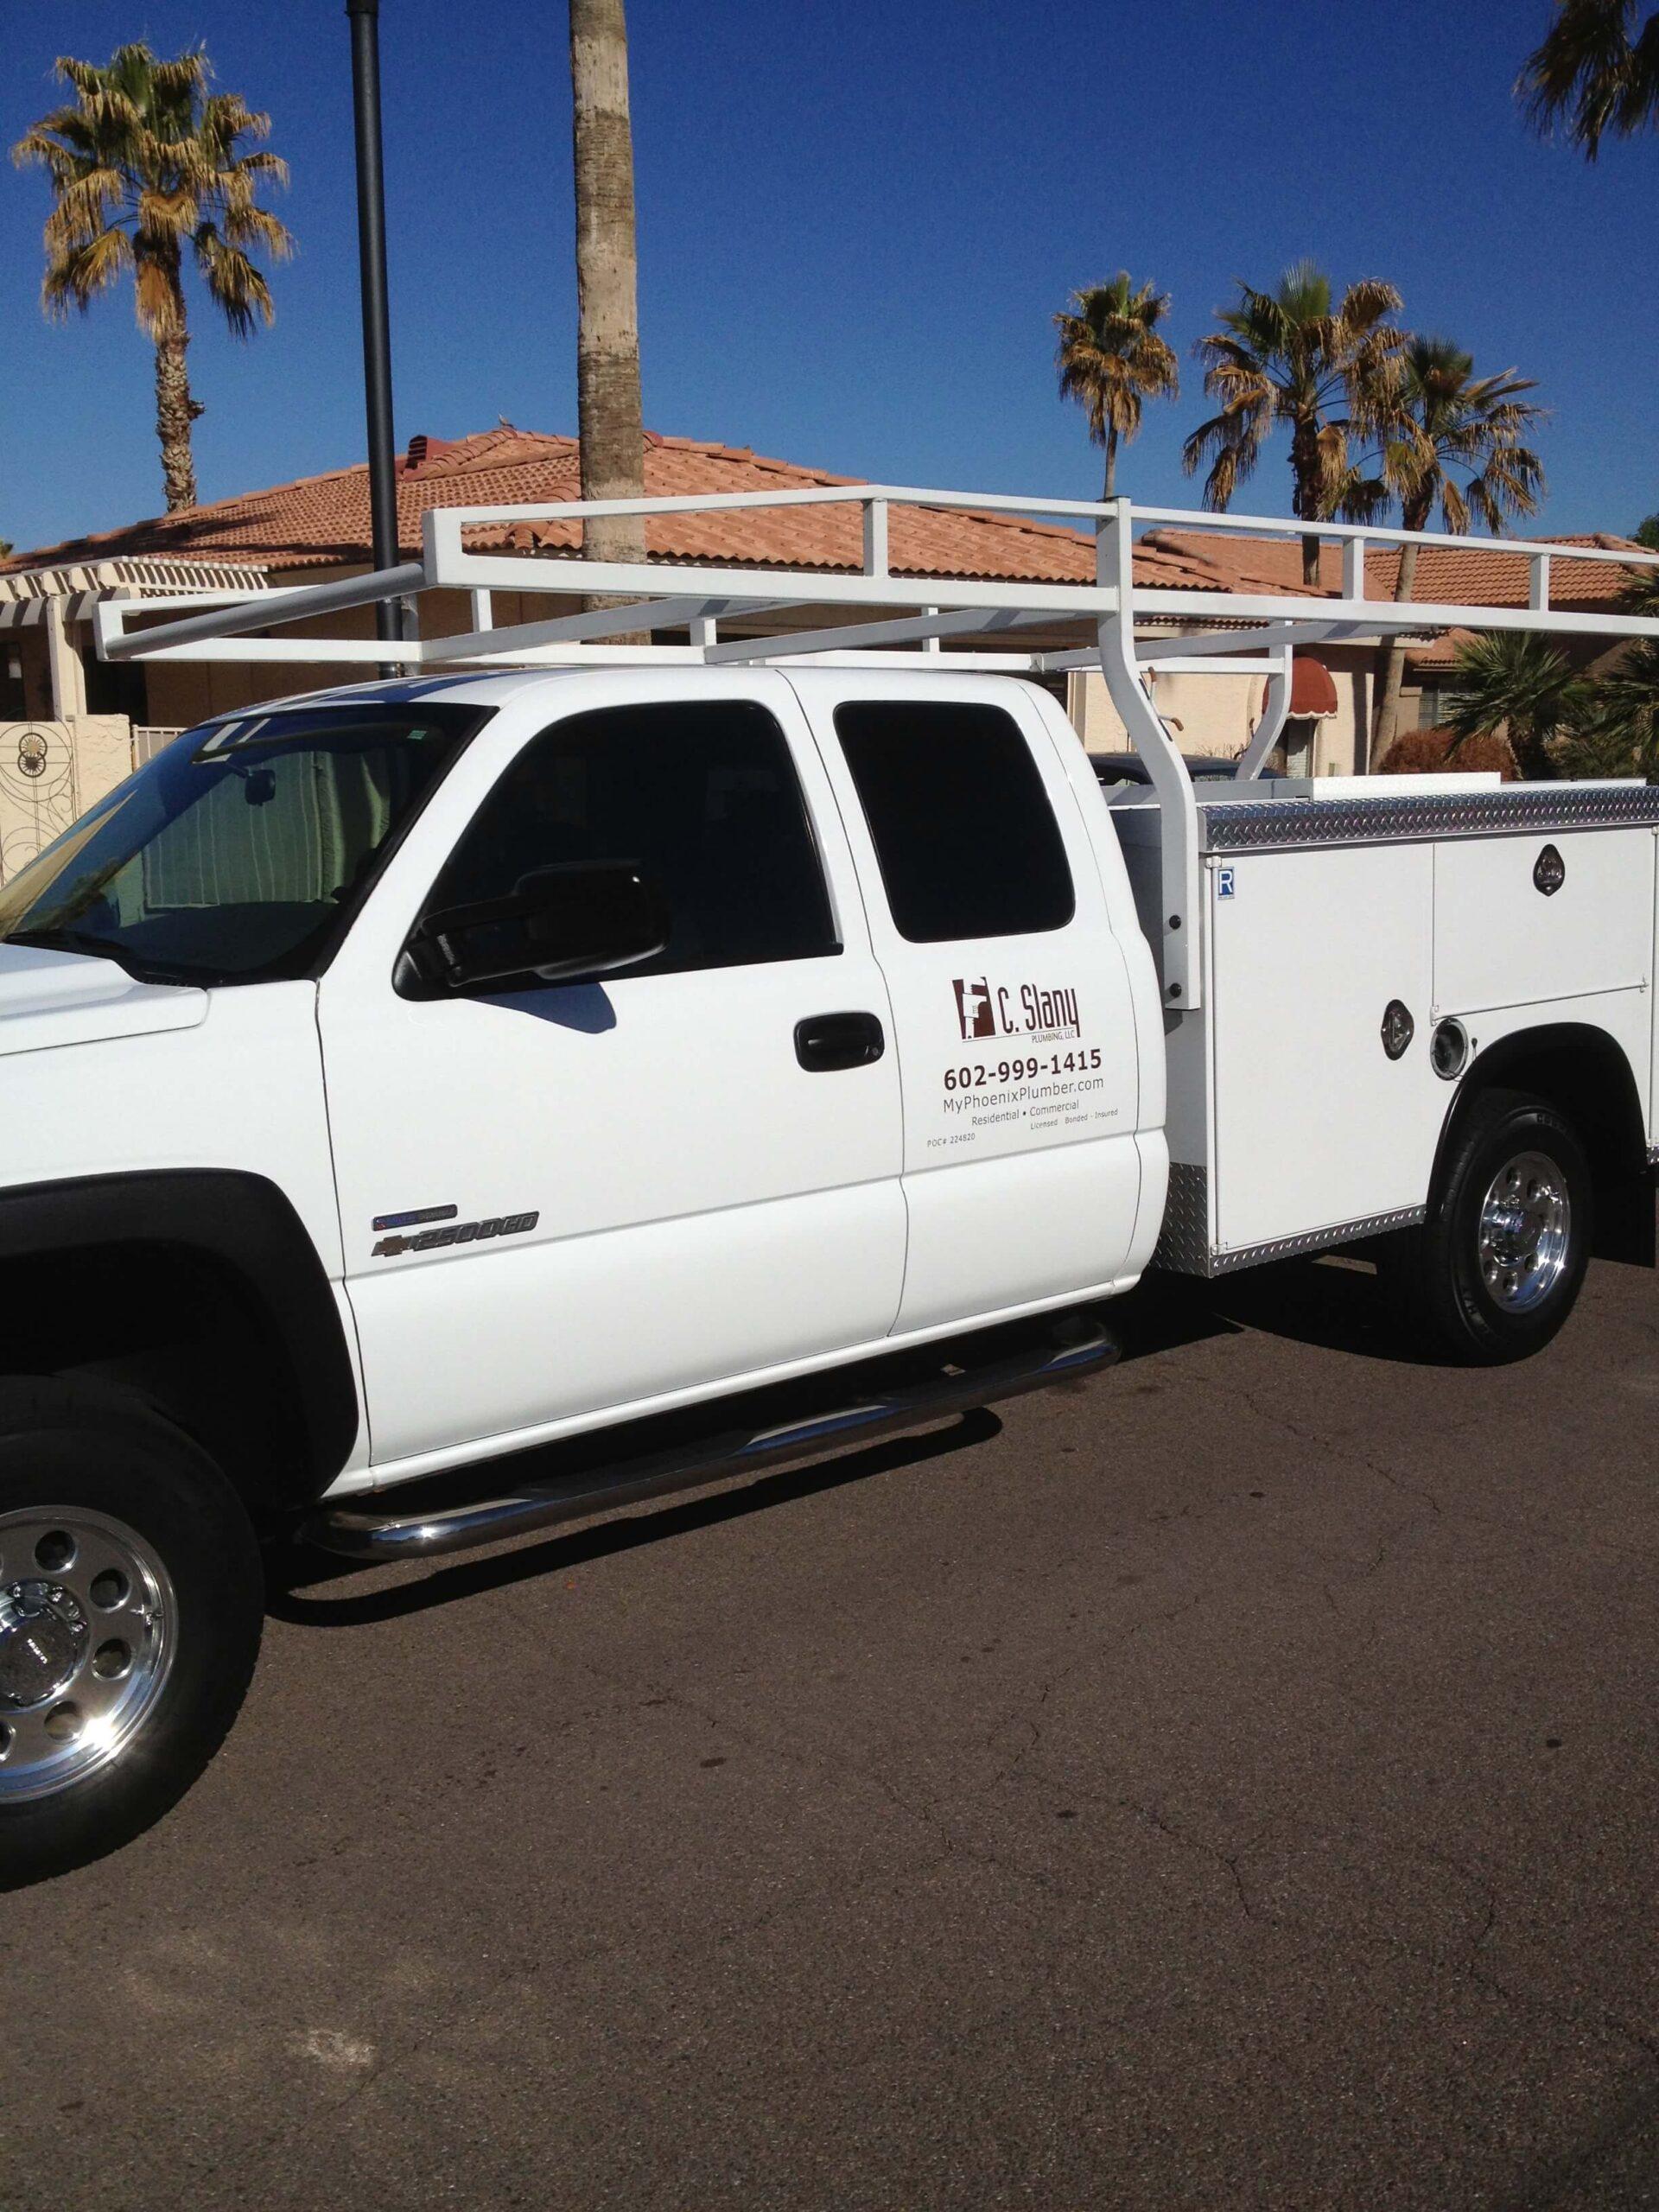 C. Slany Plumbing & Water Conditioning